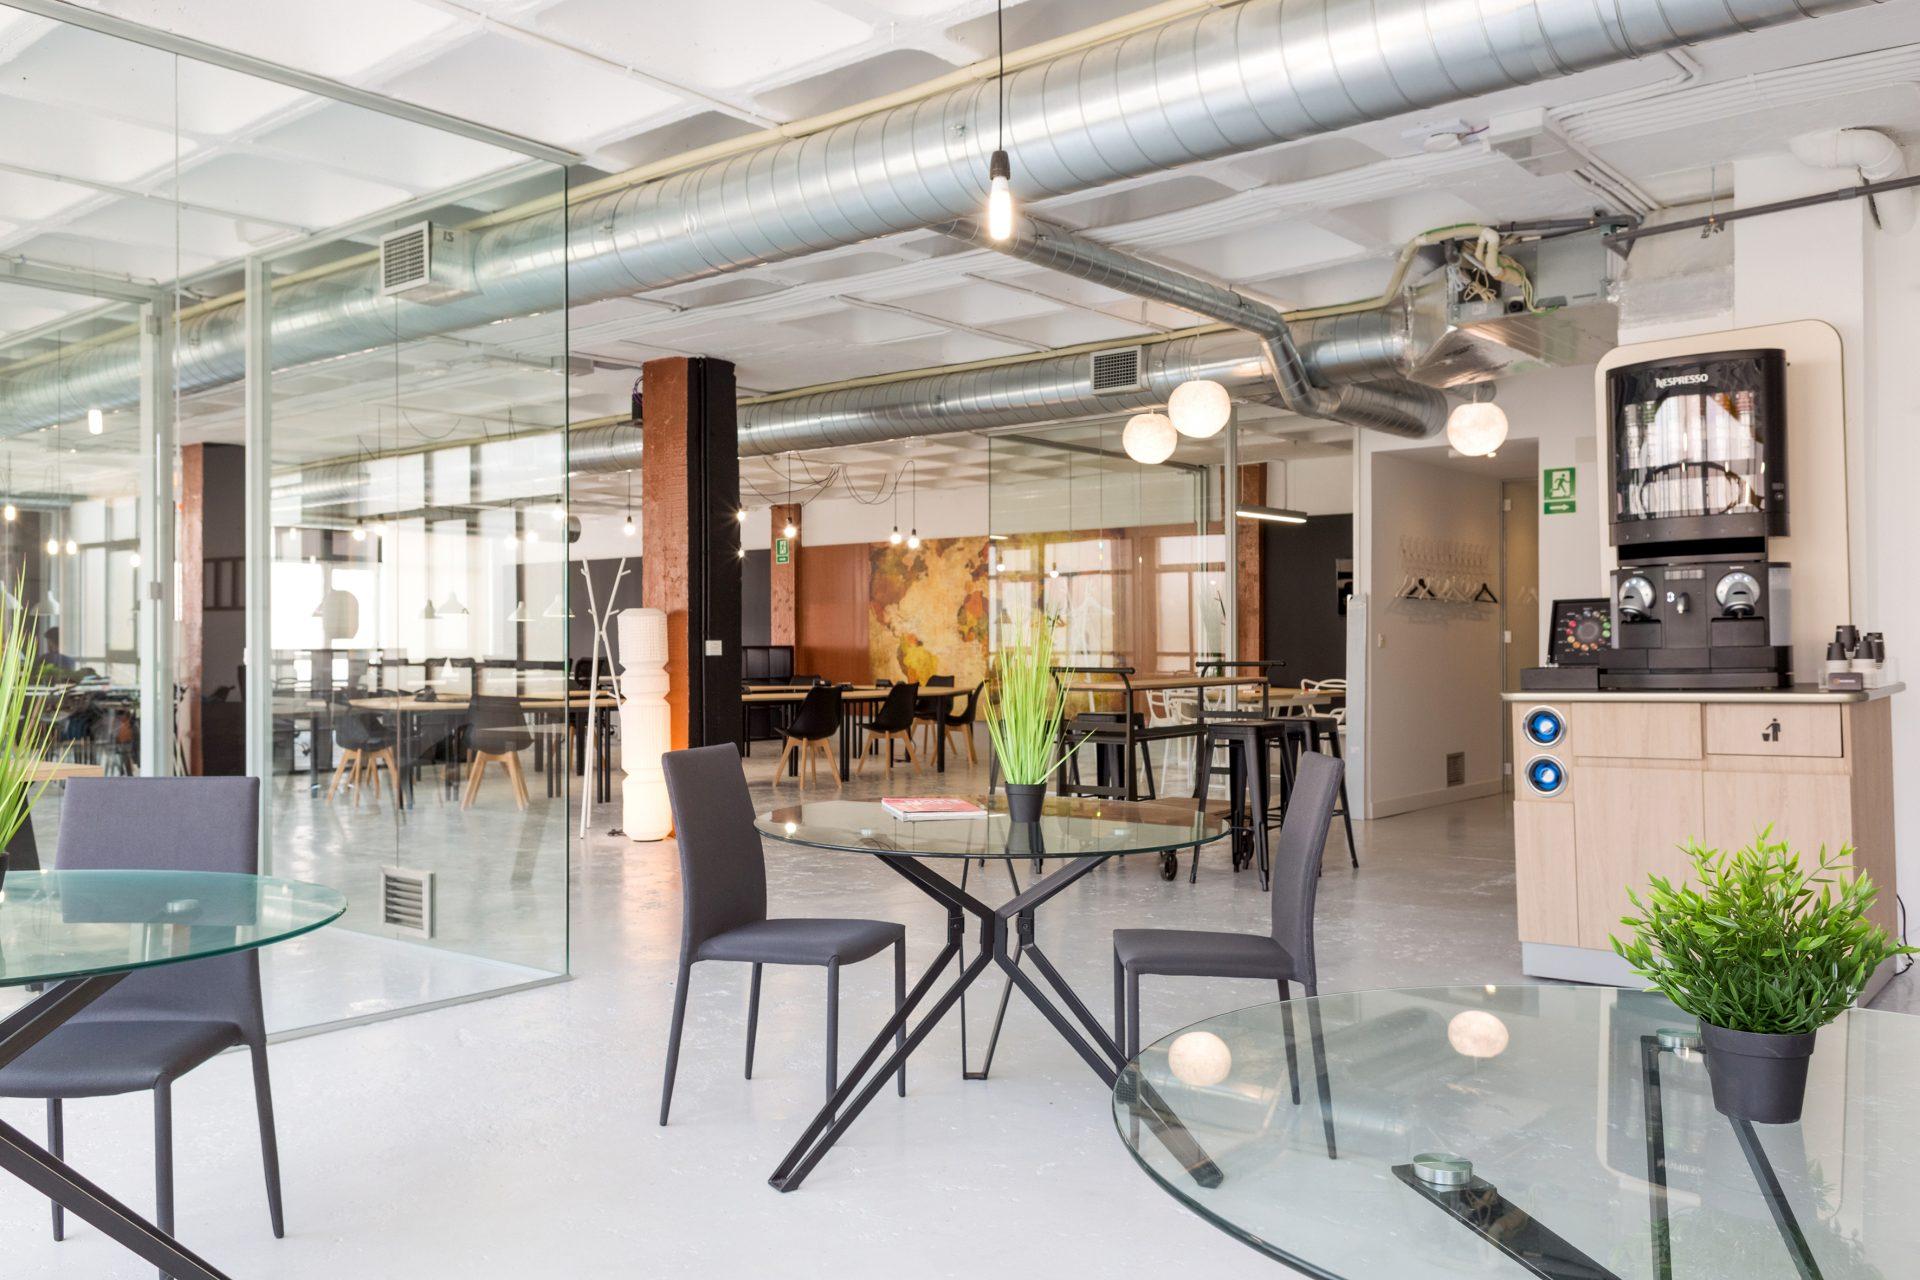 Nespresso-Biworking-networking-coliving-descanso-innovación